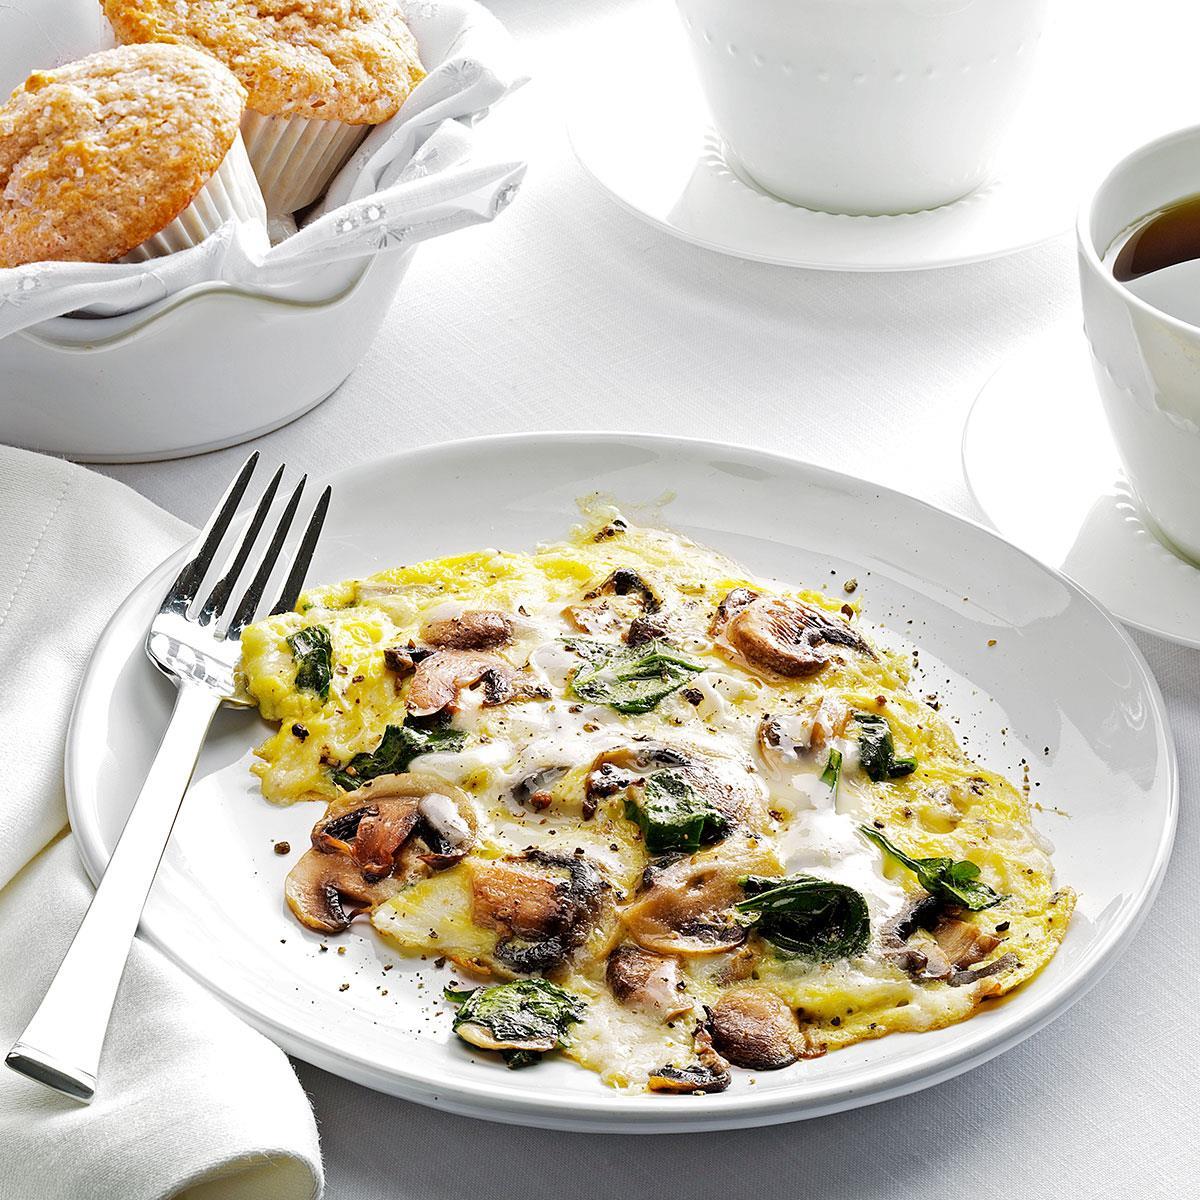 Spinach Mushroom Scrambled Eggs Recipe How To Make It Taste Of Home